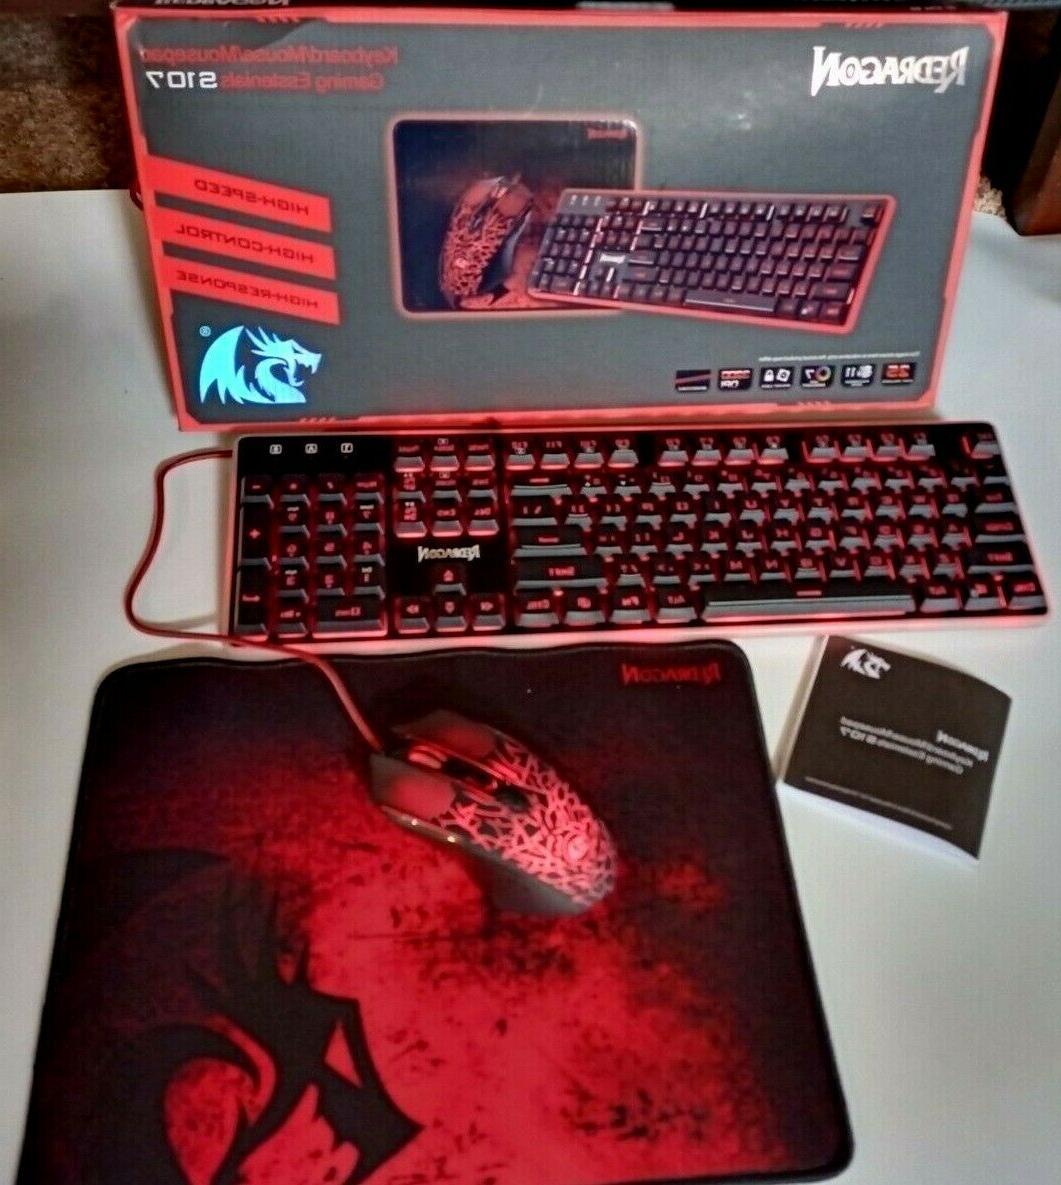 3 in 1 red dragon keyboard essentials